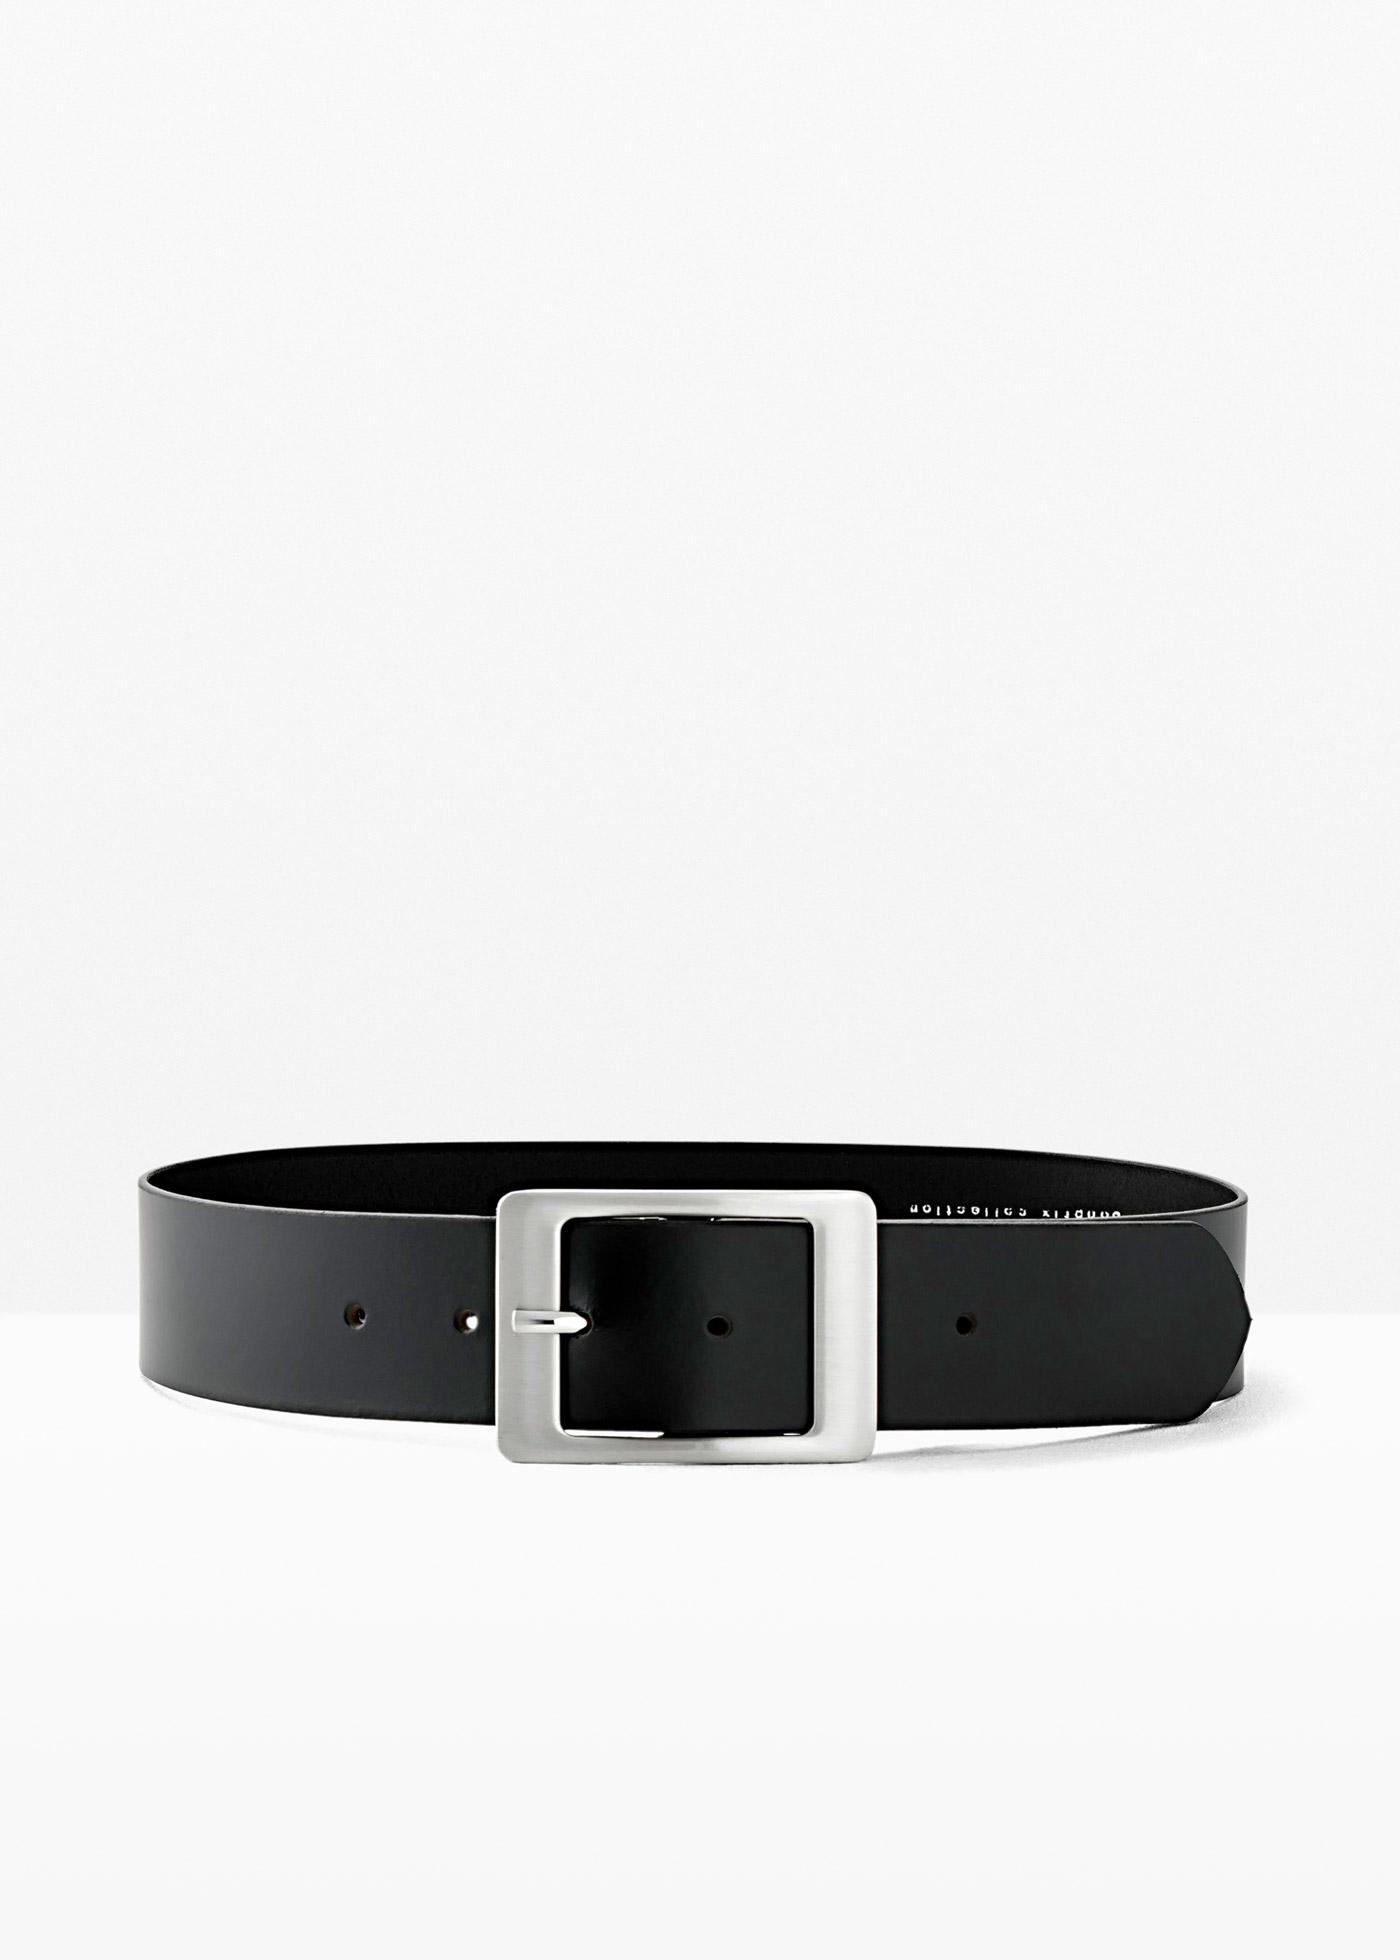 Cintura in pelle Kayla (Nero) - bpc bonprix collection